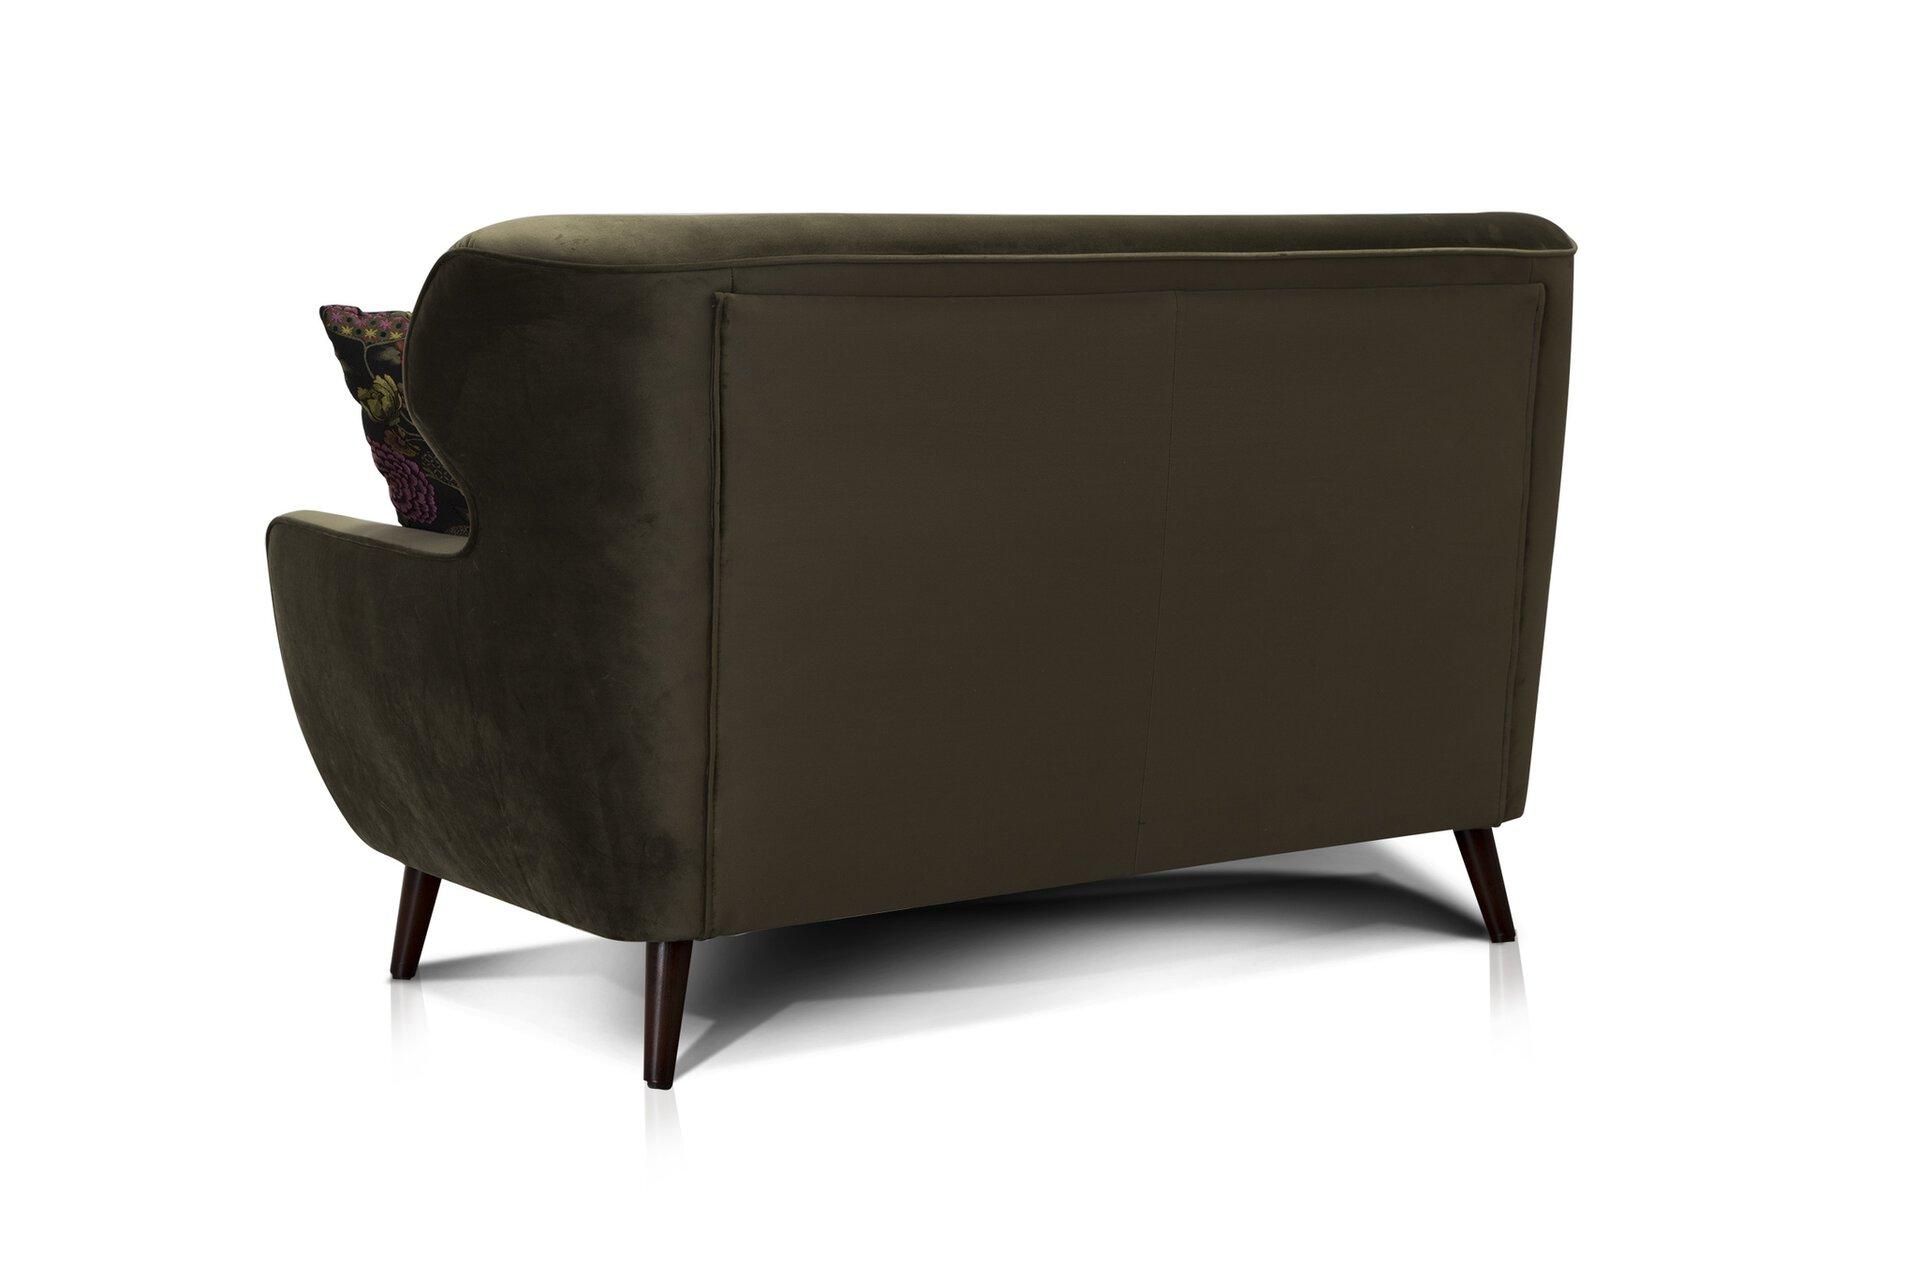 Sofa 2-Sitzer ABERDEEN CELECT Textil 1 x 1 x 2 cm